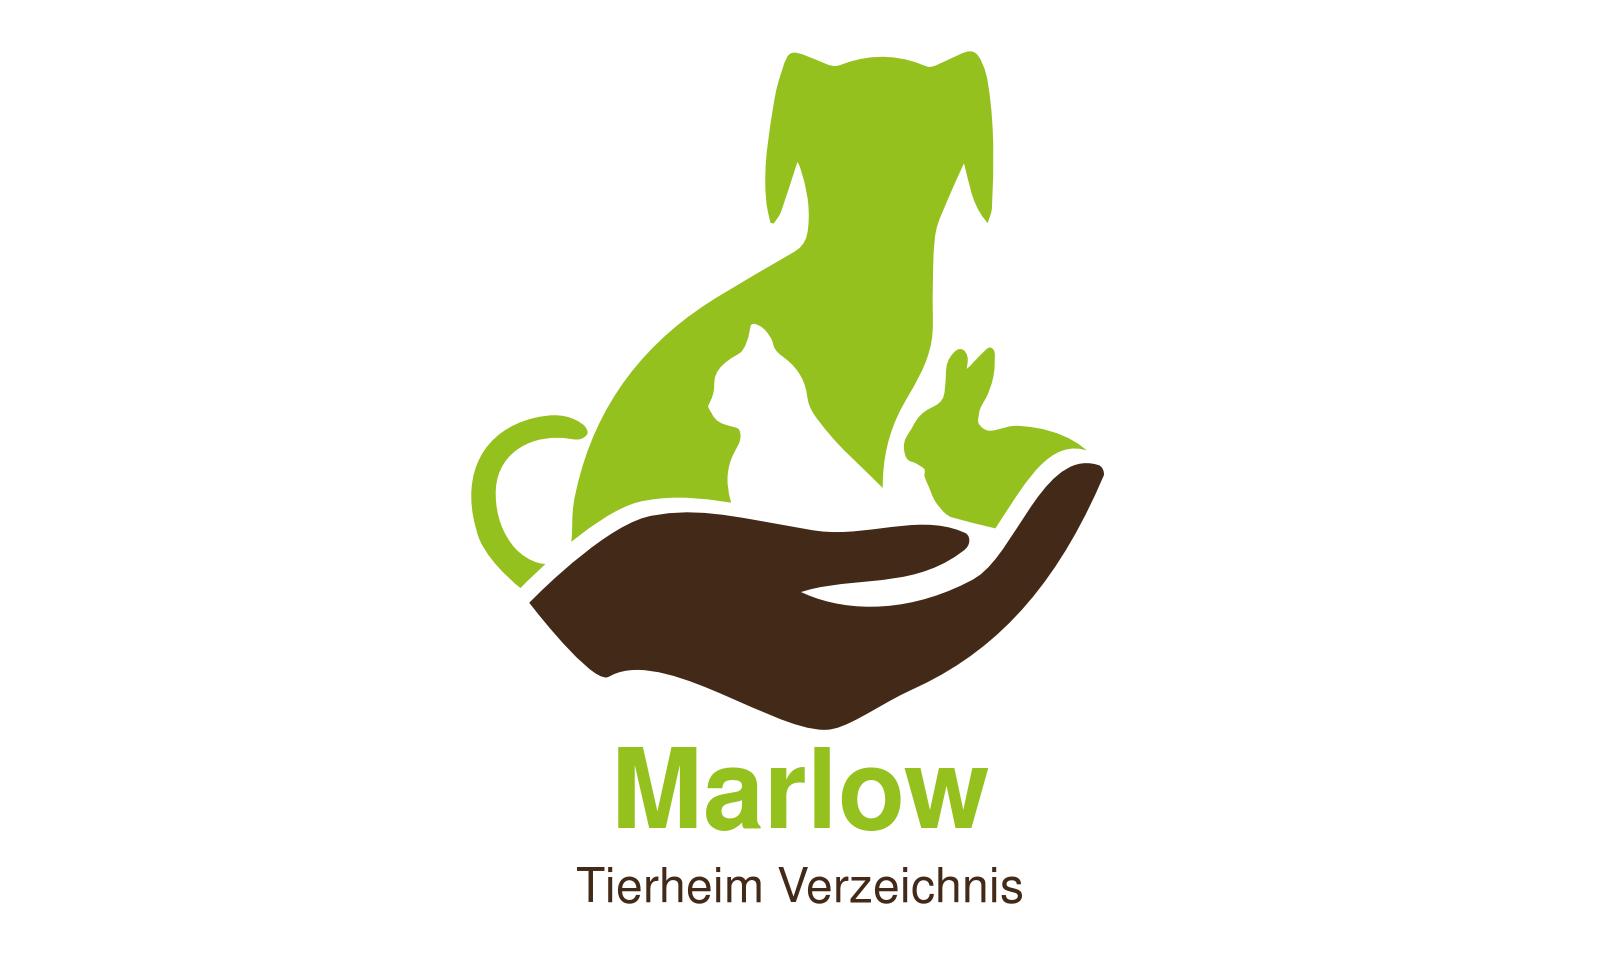 Tierheim Marlow